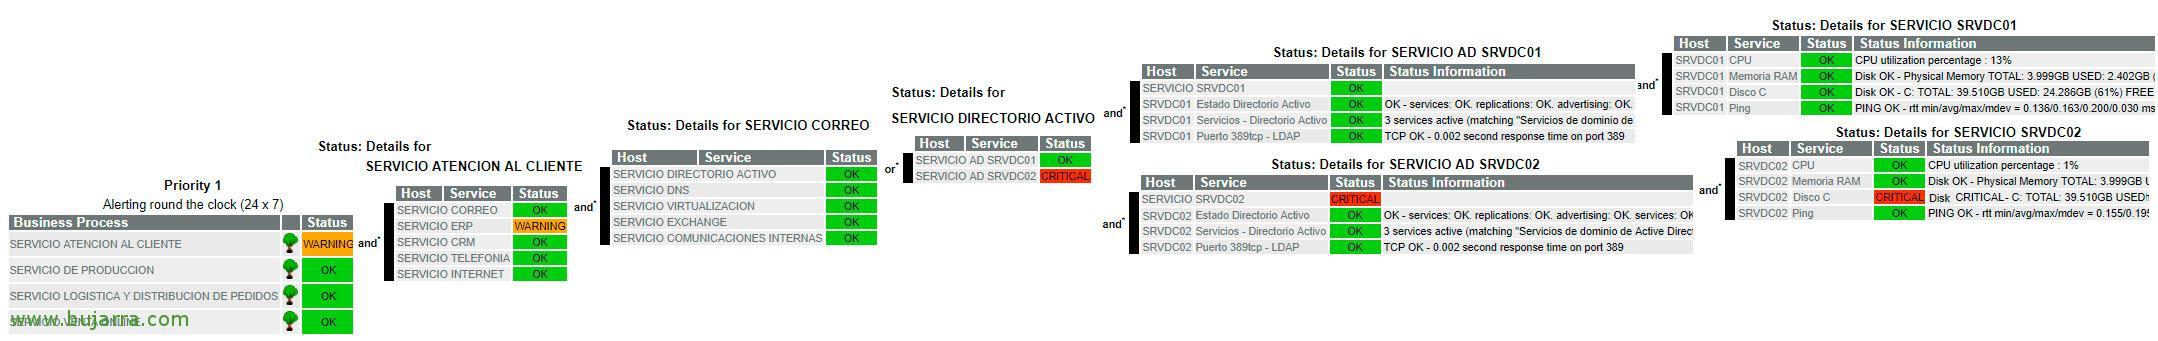 Service-Business-19